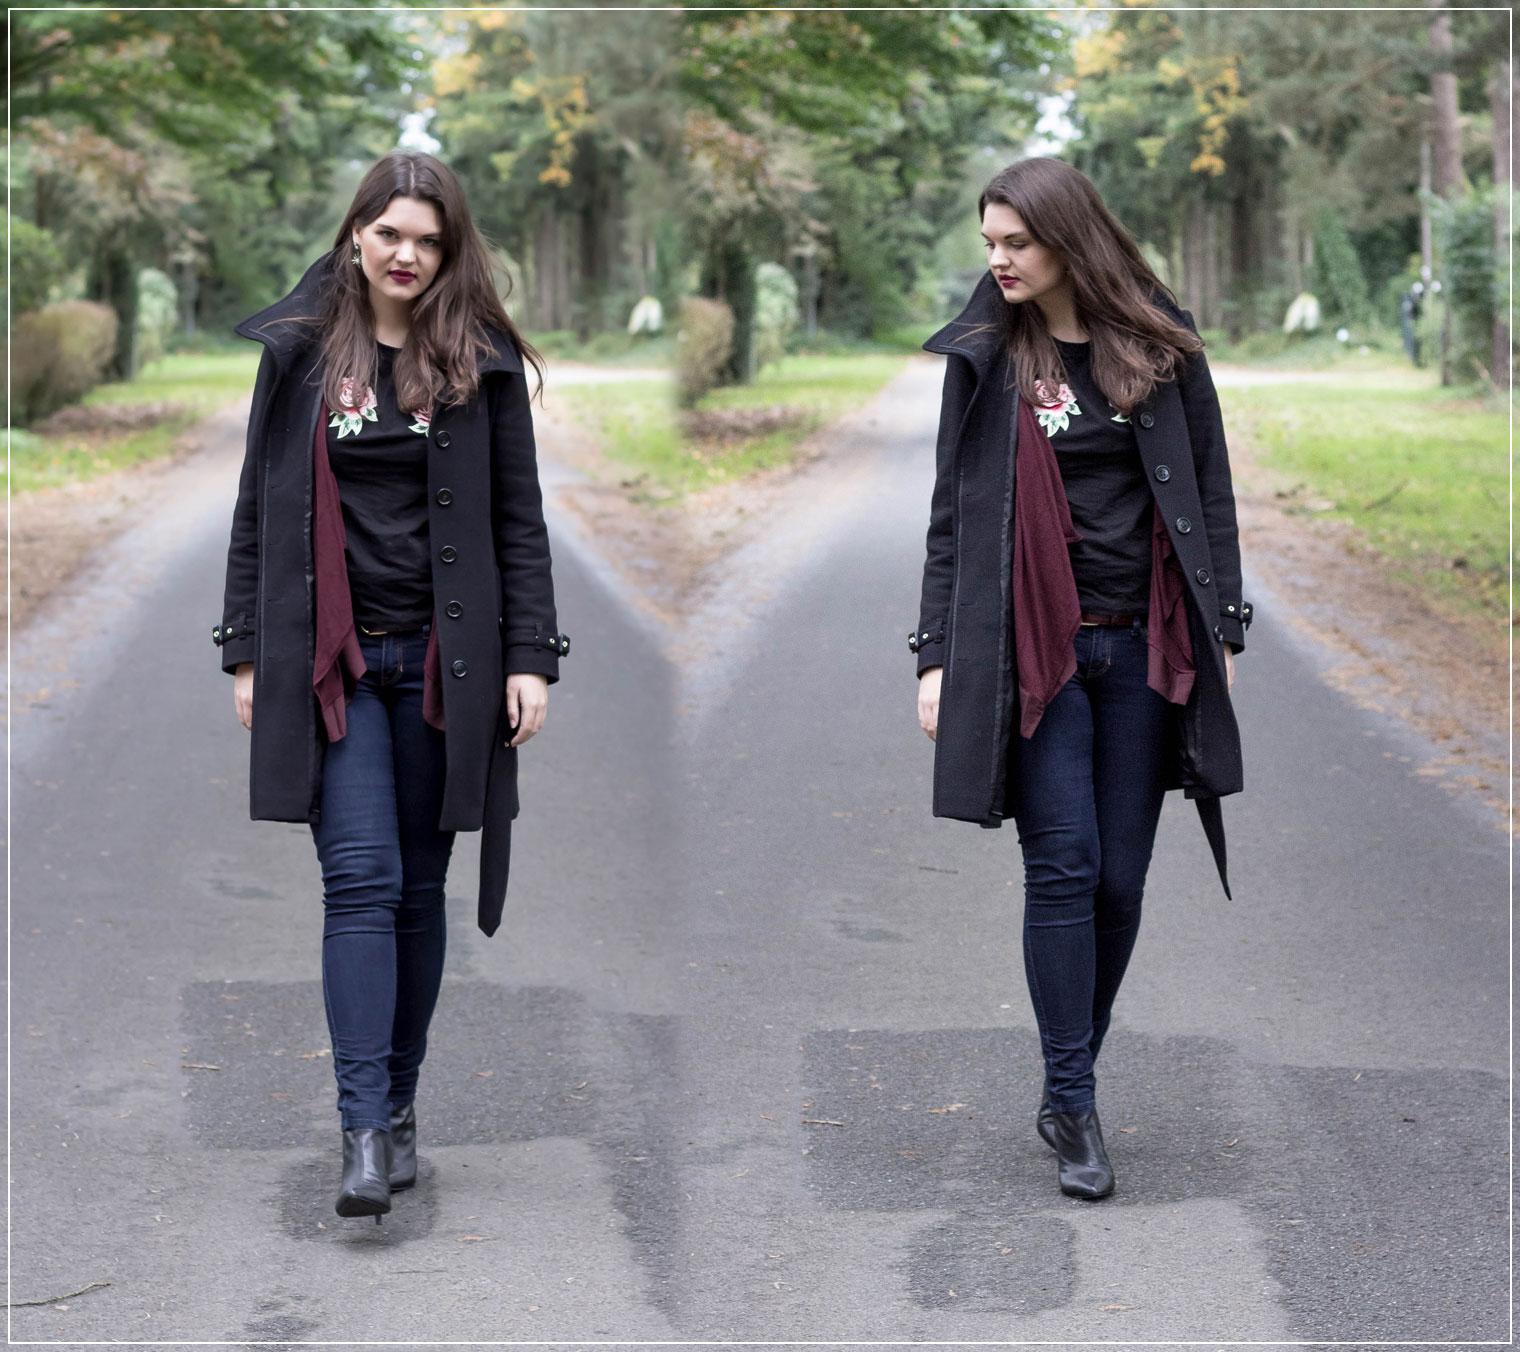 Herbstoutfit,Layering, weinrot, weinrotes Layering, Herbsttrend, Fashiontrend, Modetrend, Ruhrgebiet, Herbst, Autumnstyle, Herbstlook